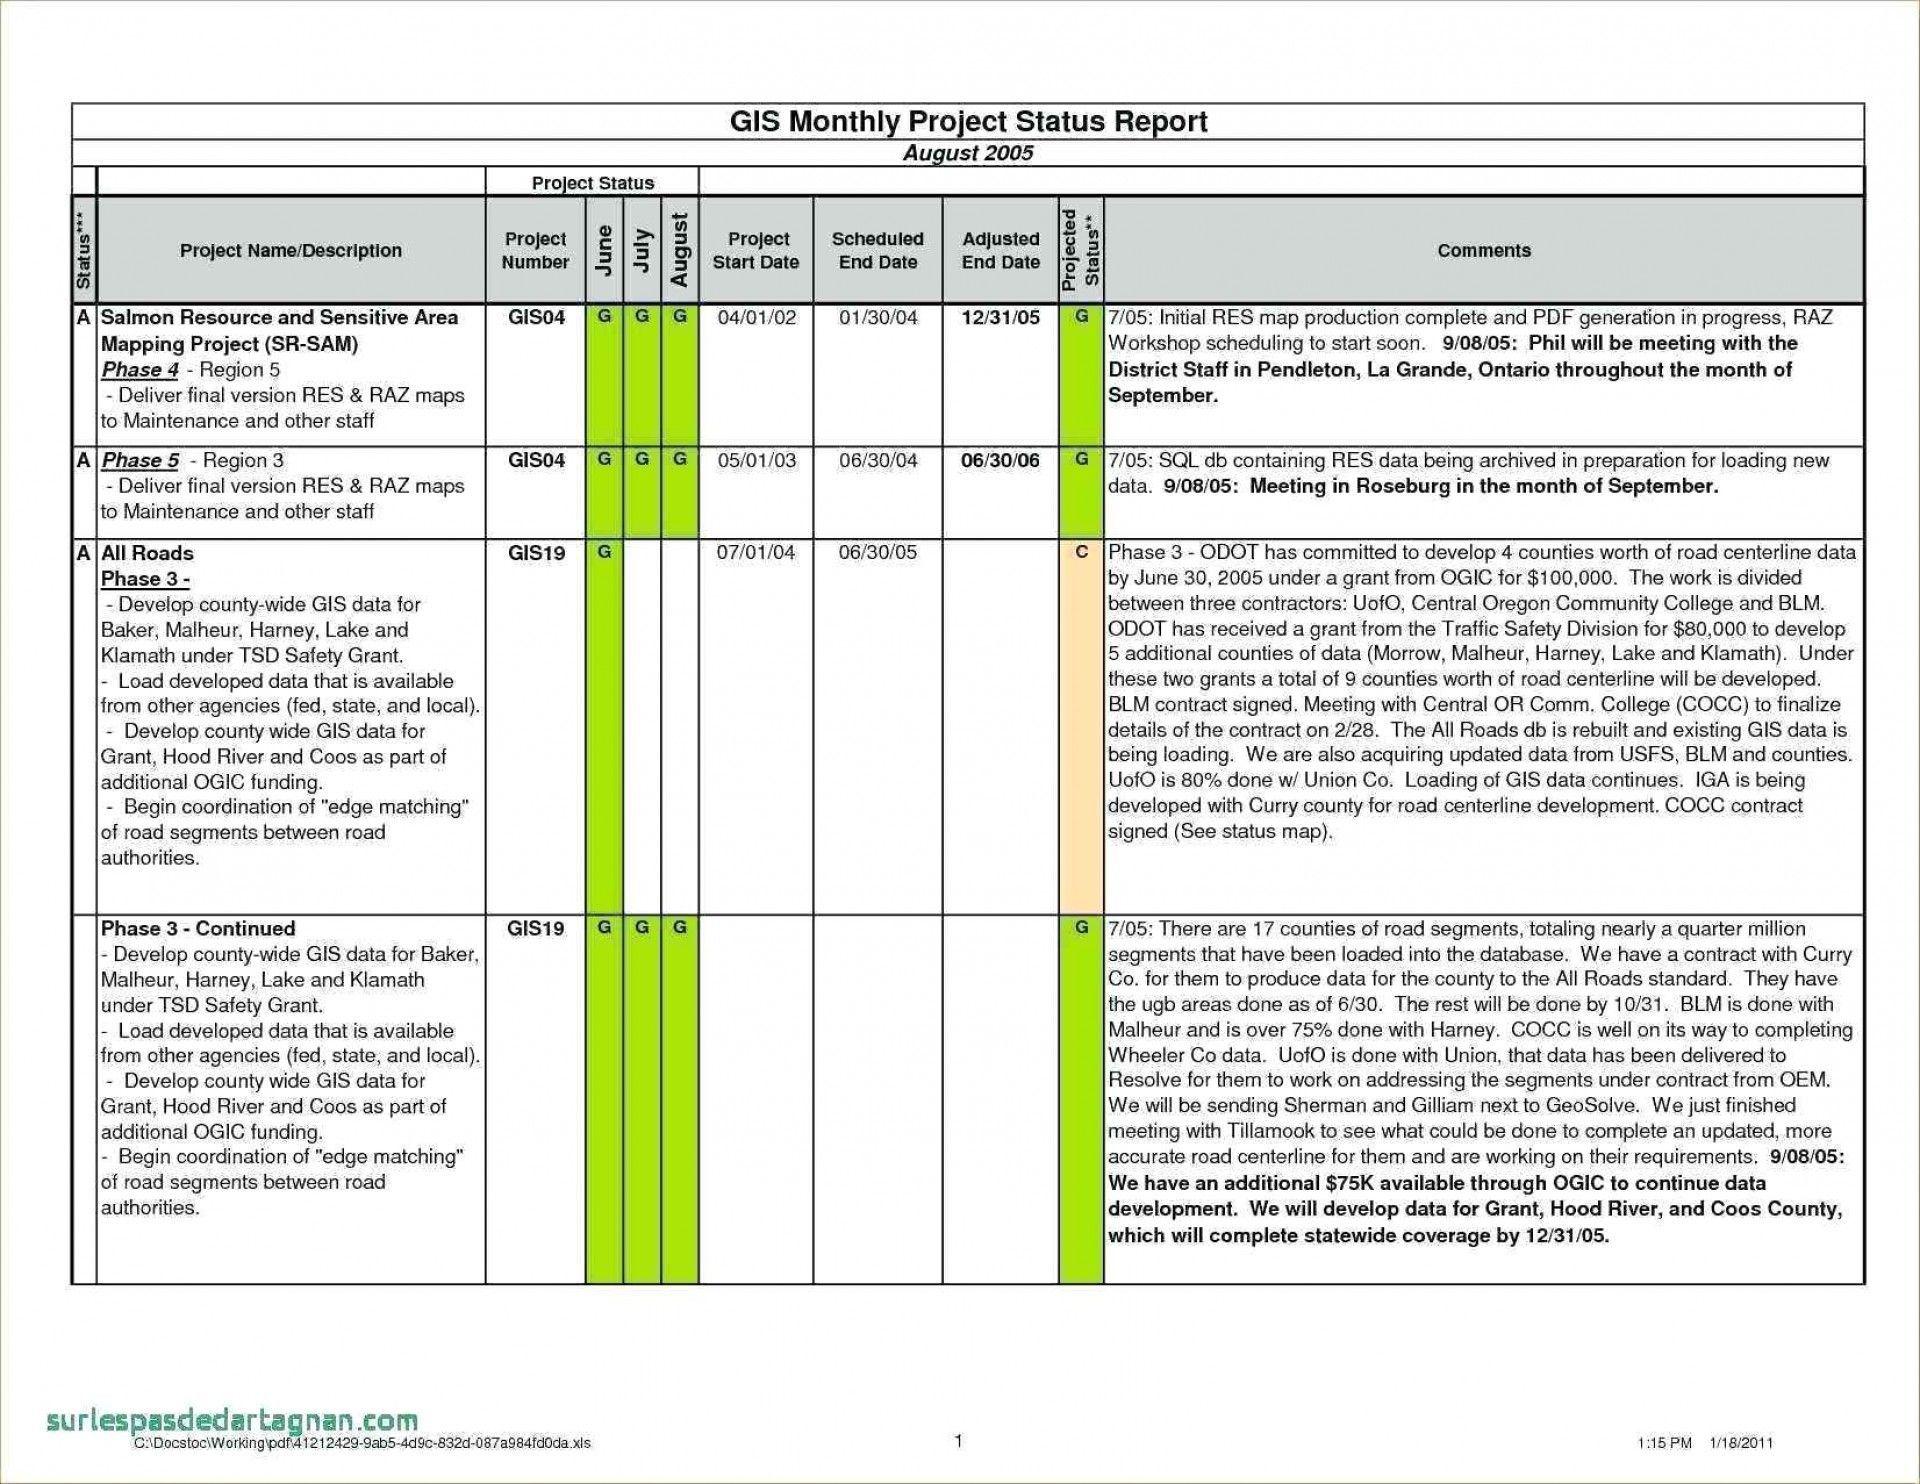 000 Unbelievable Project Management Progres Report Template Excel Sample  StatuFull